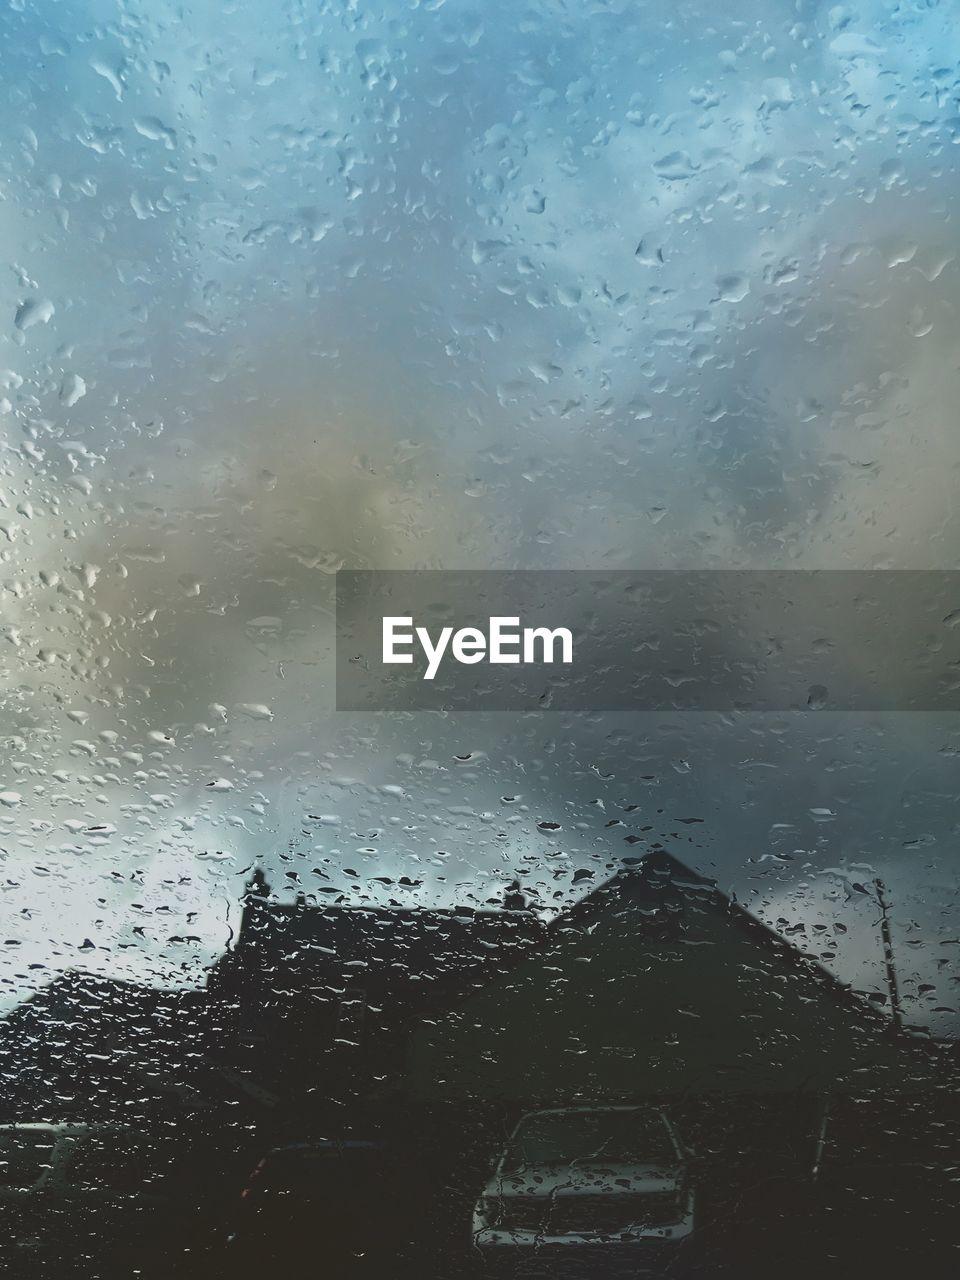 water, drop, wet, car, no people, window, land vehicle, raindrop, car interior, day, backgrounds, indoors, close-up, nature, car wash, sky